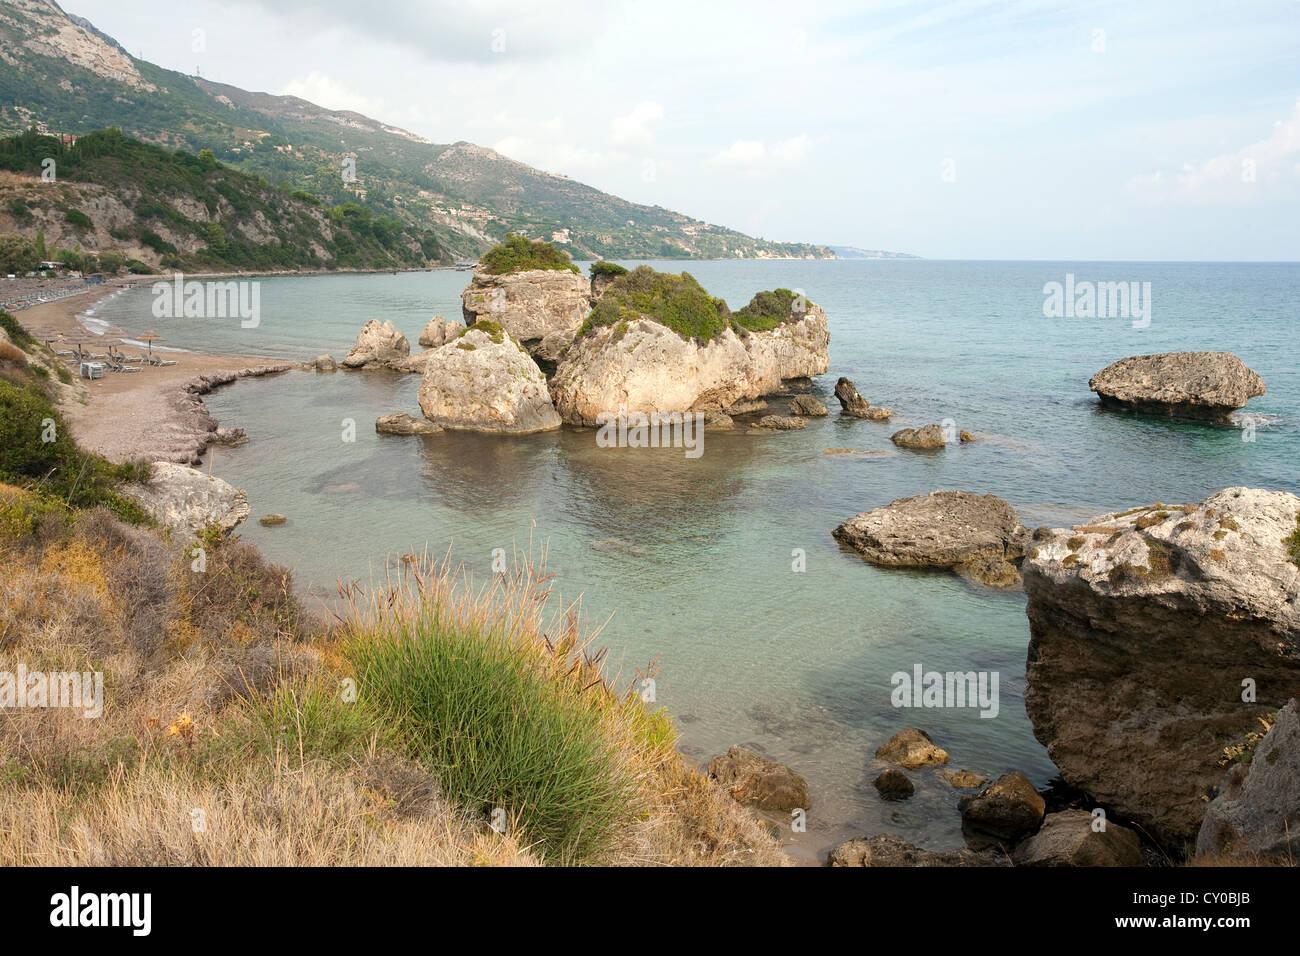 Beach of Porto Zoro, Zakynthos island, Greece, Europe - Stock Image